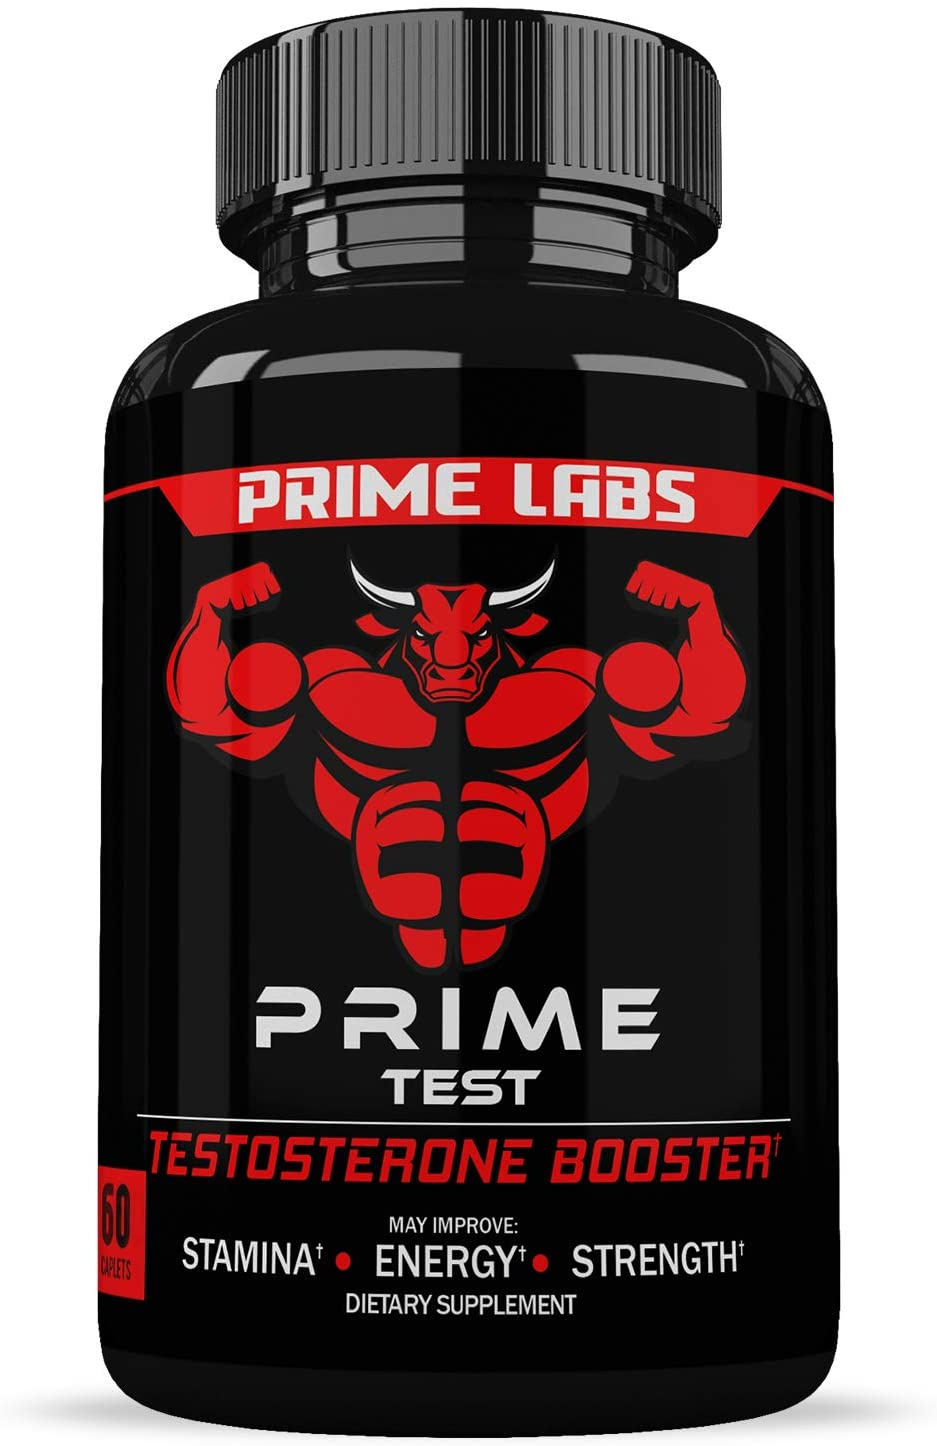 Prime Labs